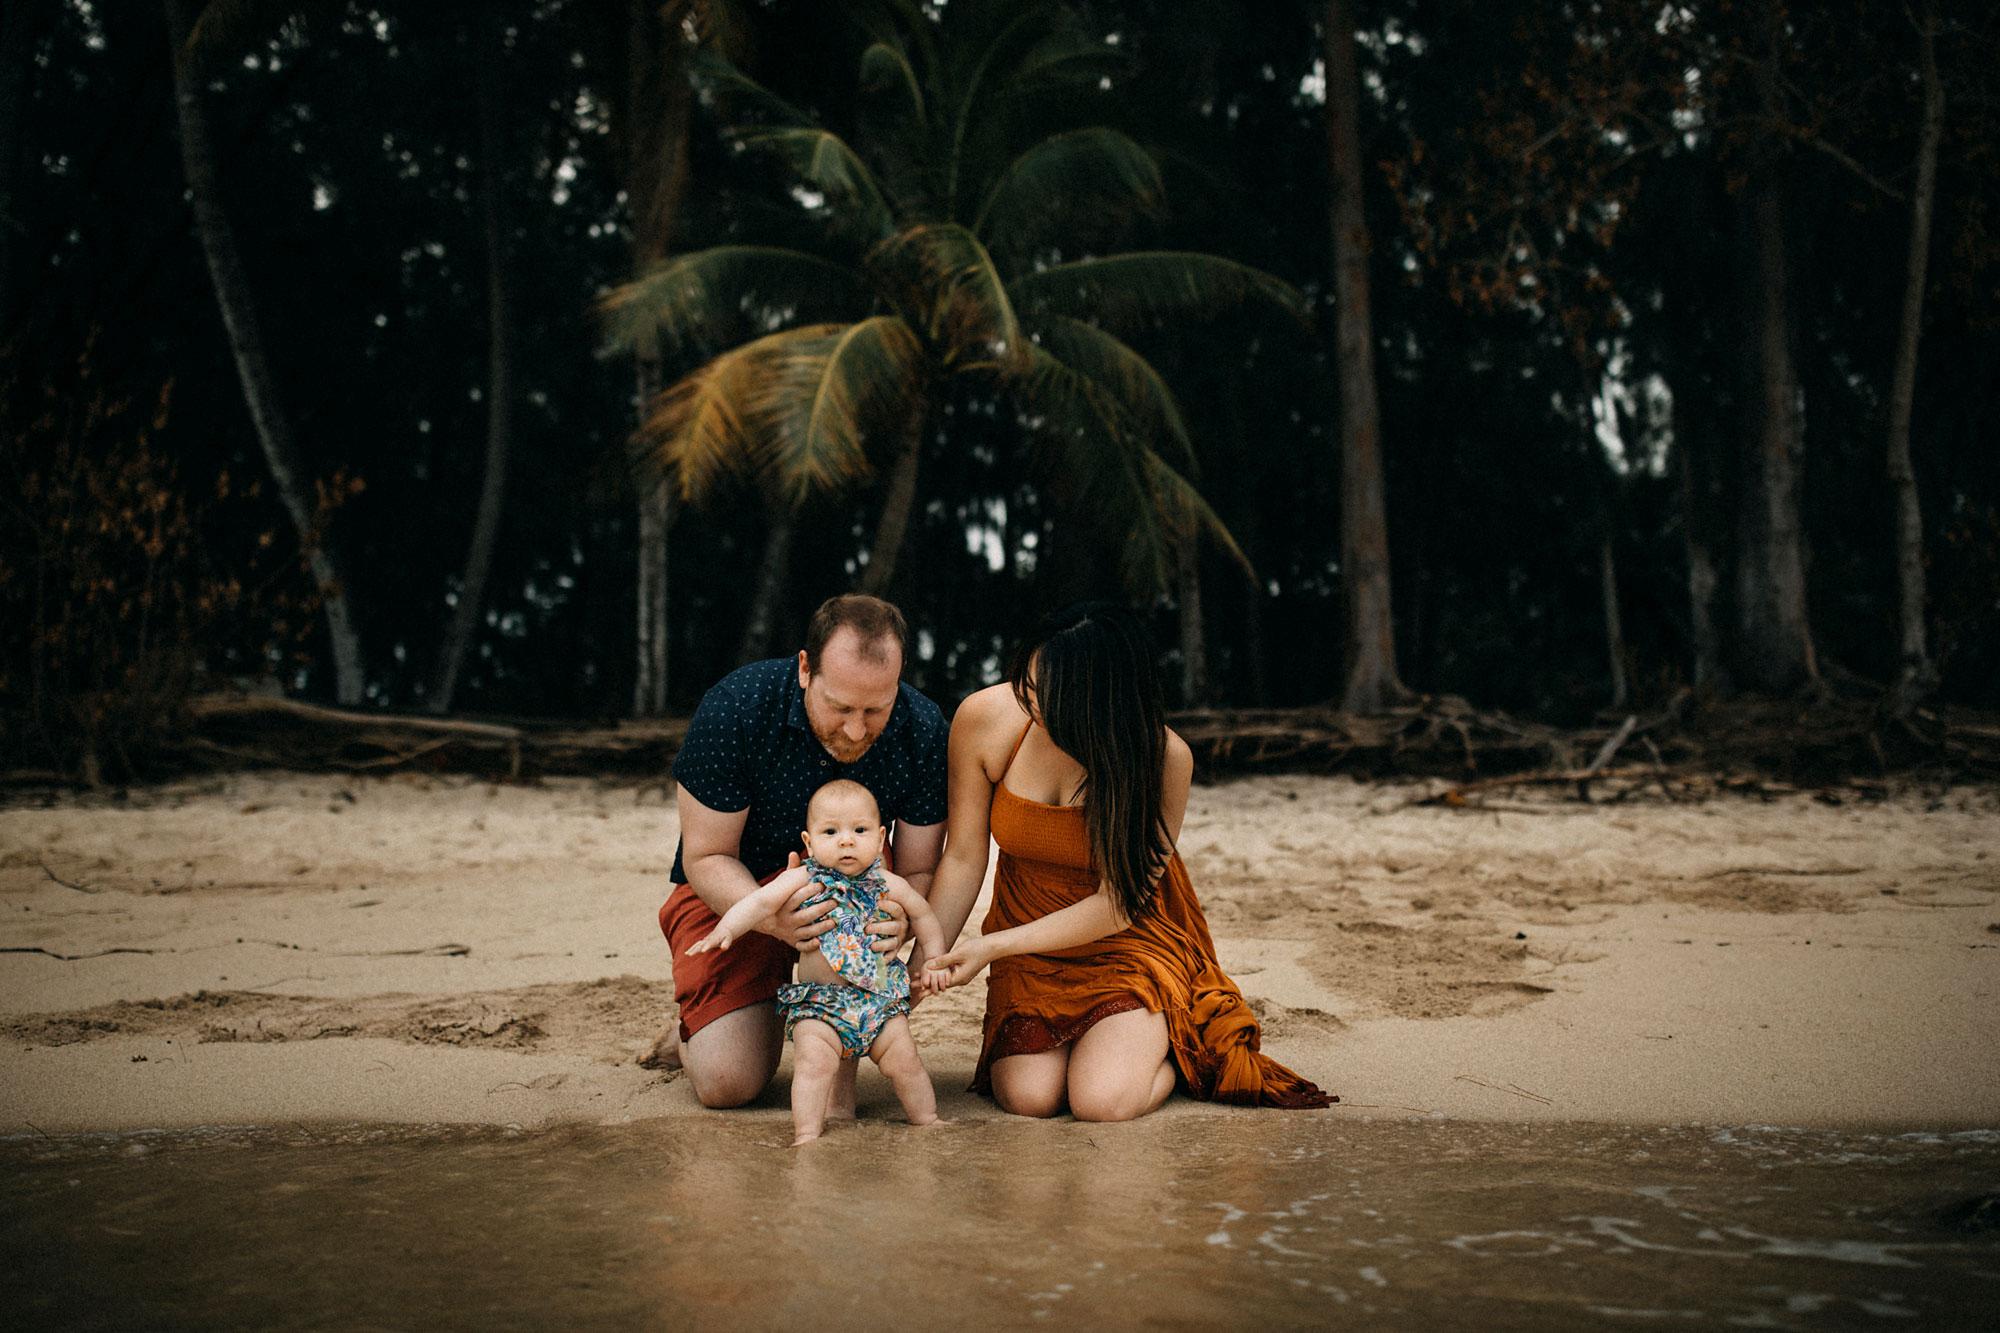 Family-Photographer-North-Shore-Oahu-Hawaii-14.jpg